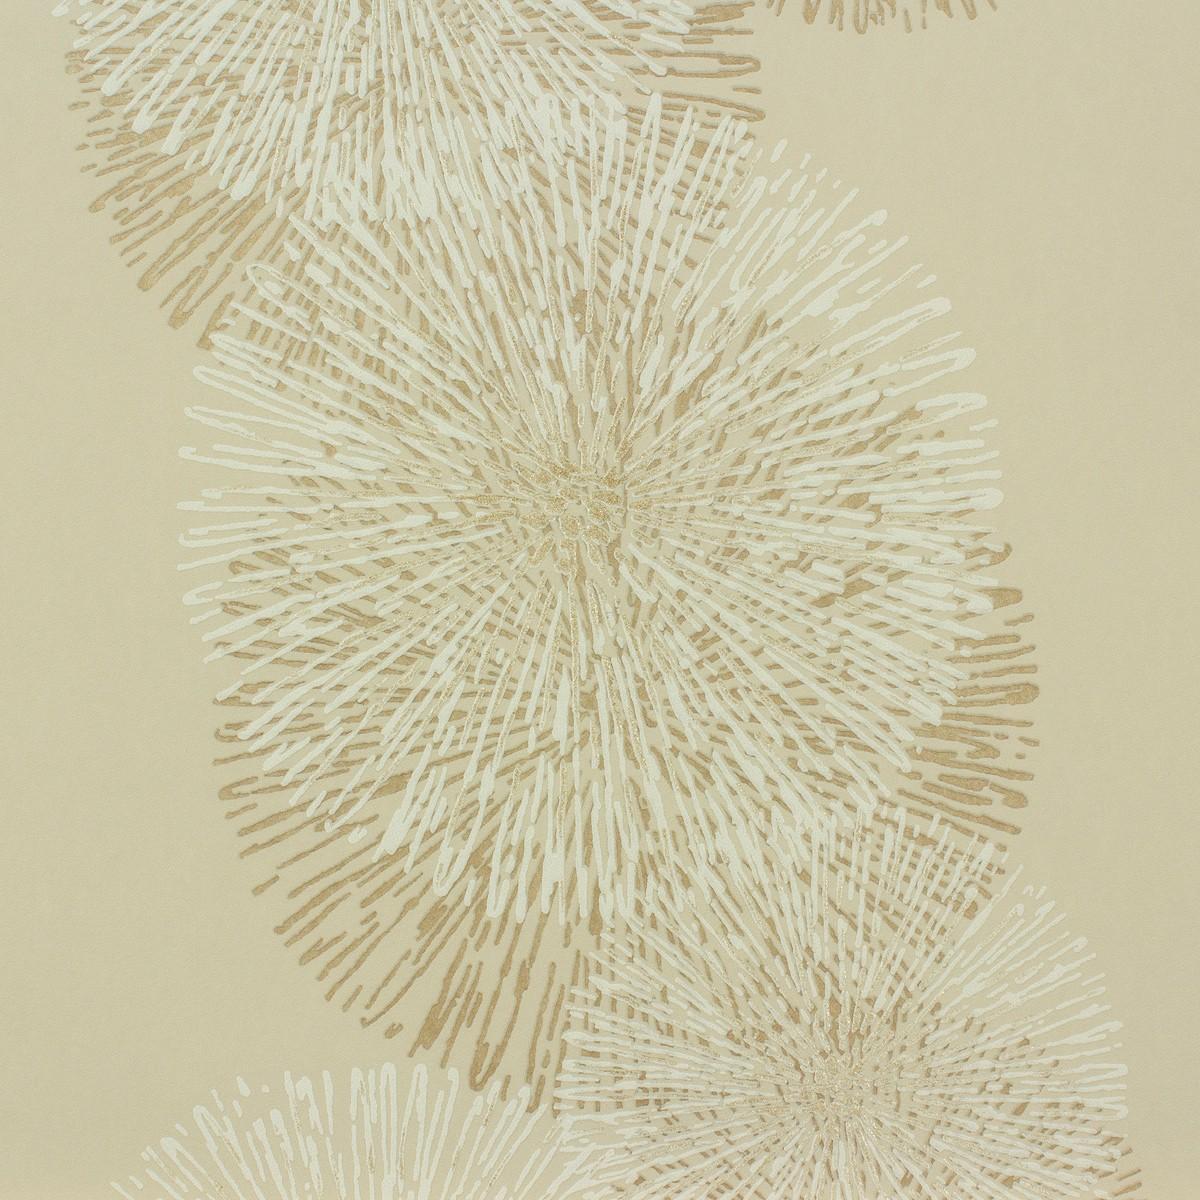 sch ner wohnen 6 tapete beige floral 94359 2. Black Bedroom Furniture Sets. Home Design Ideas